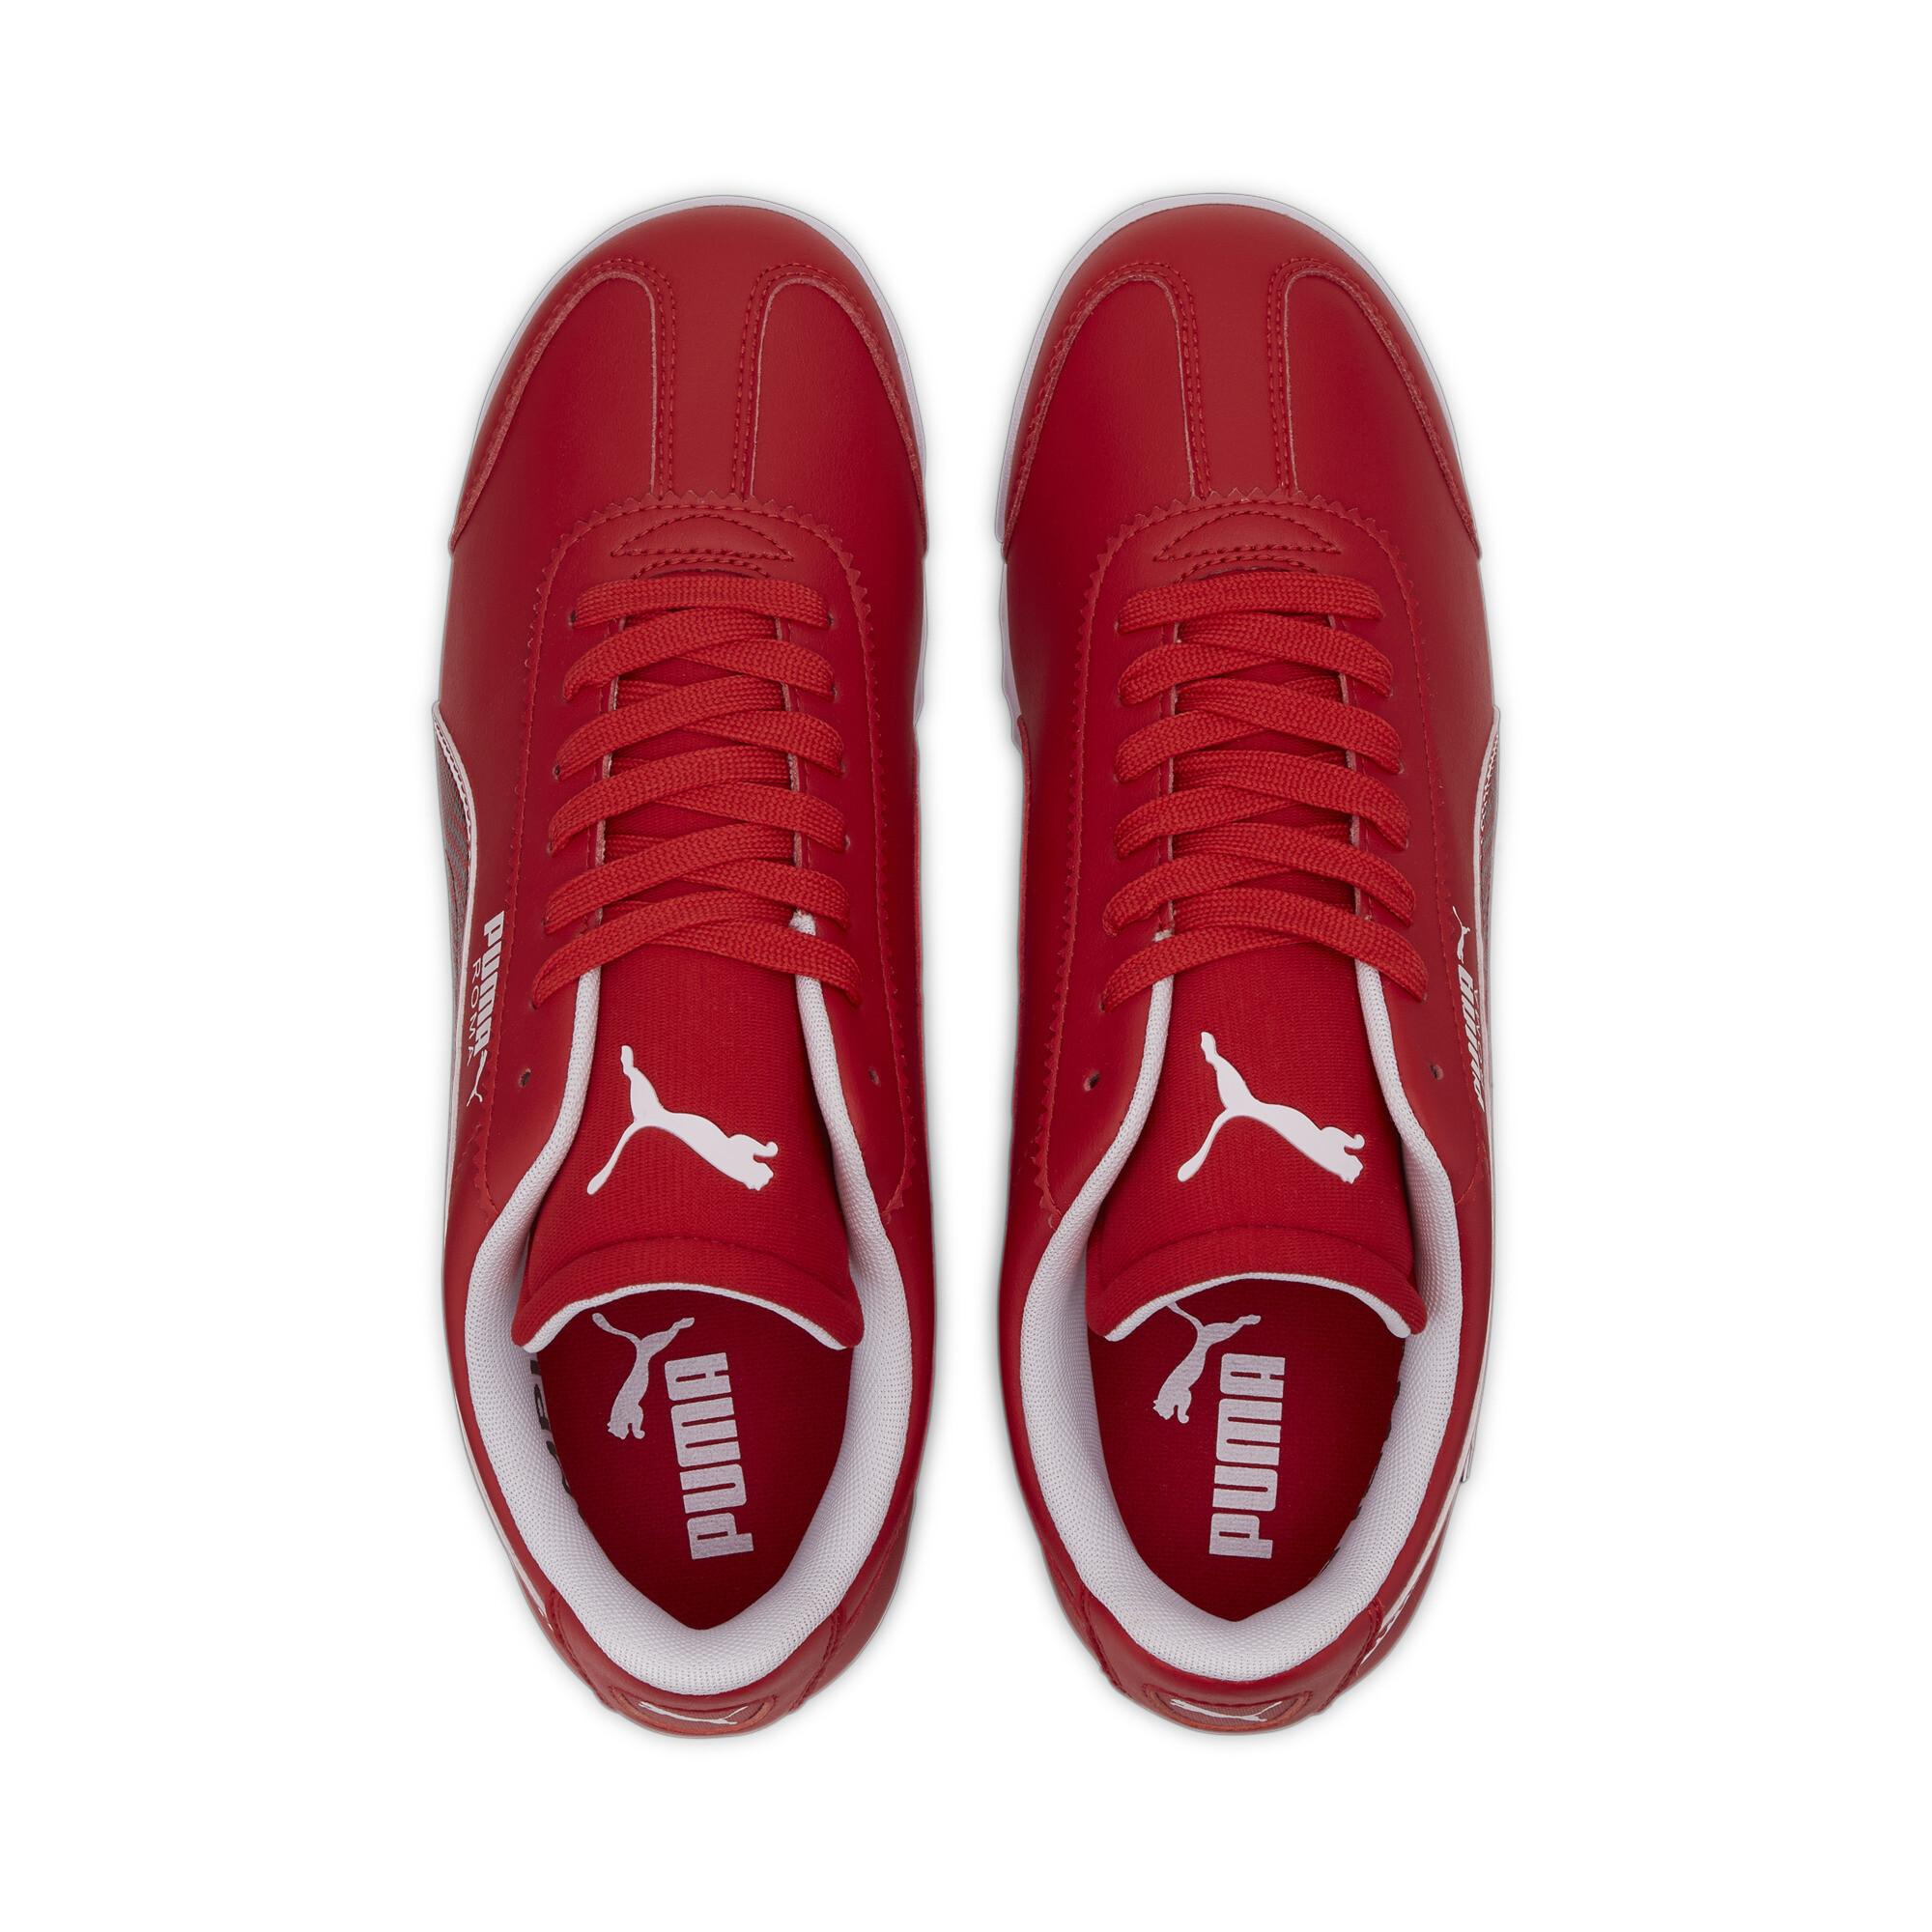 PUMA-Men-039-s-Scuderia-Ferrari-Roma-Sneakers thumbnail 23